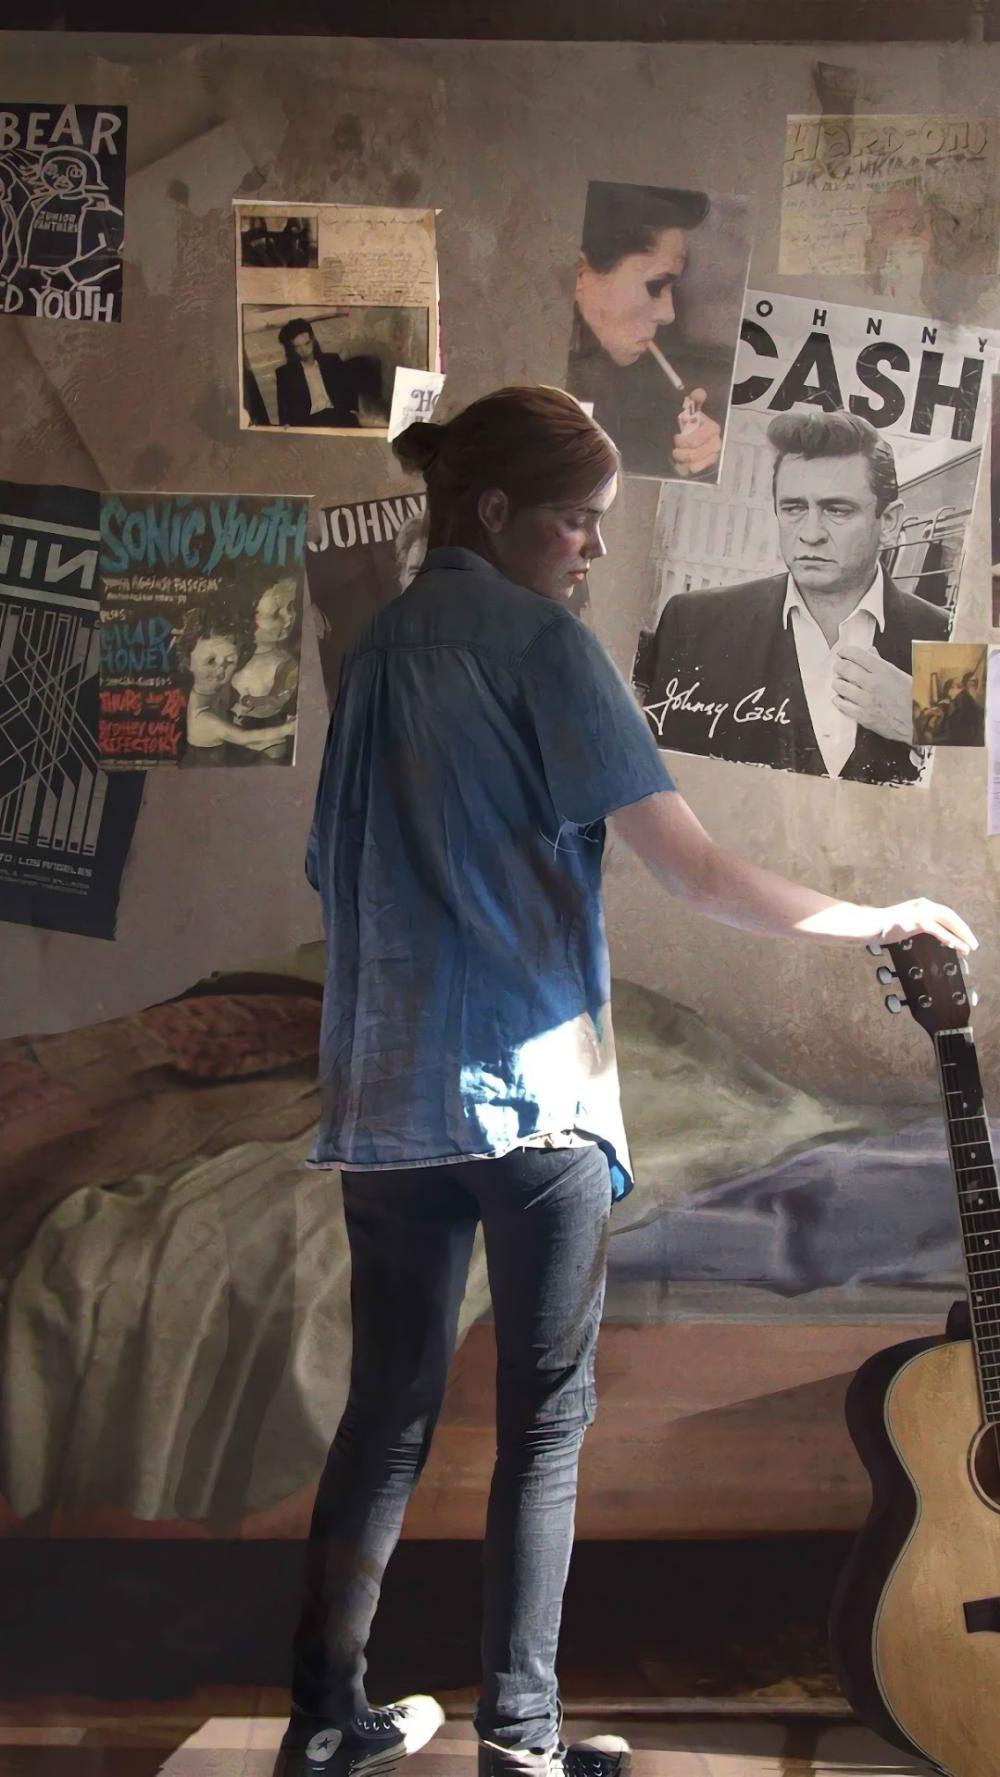 The Last Of Us Part 2 Ellie Guitar 4k Wallpaper 13 The Last Of Us The Lest Of Us The Last Of Us2